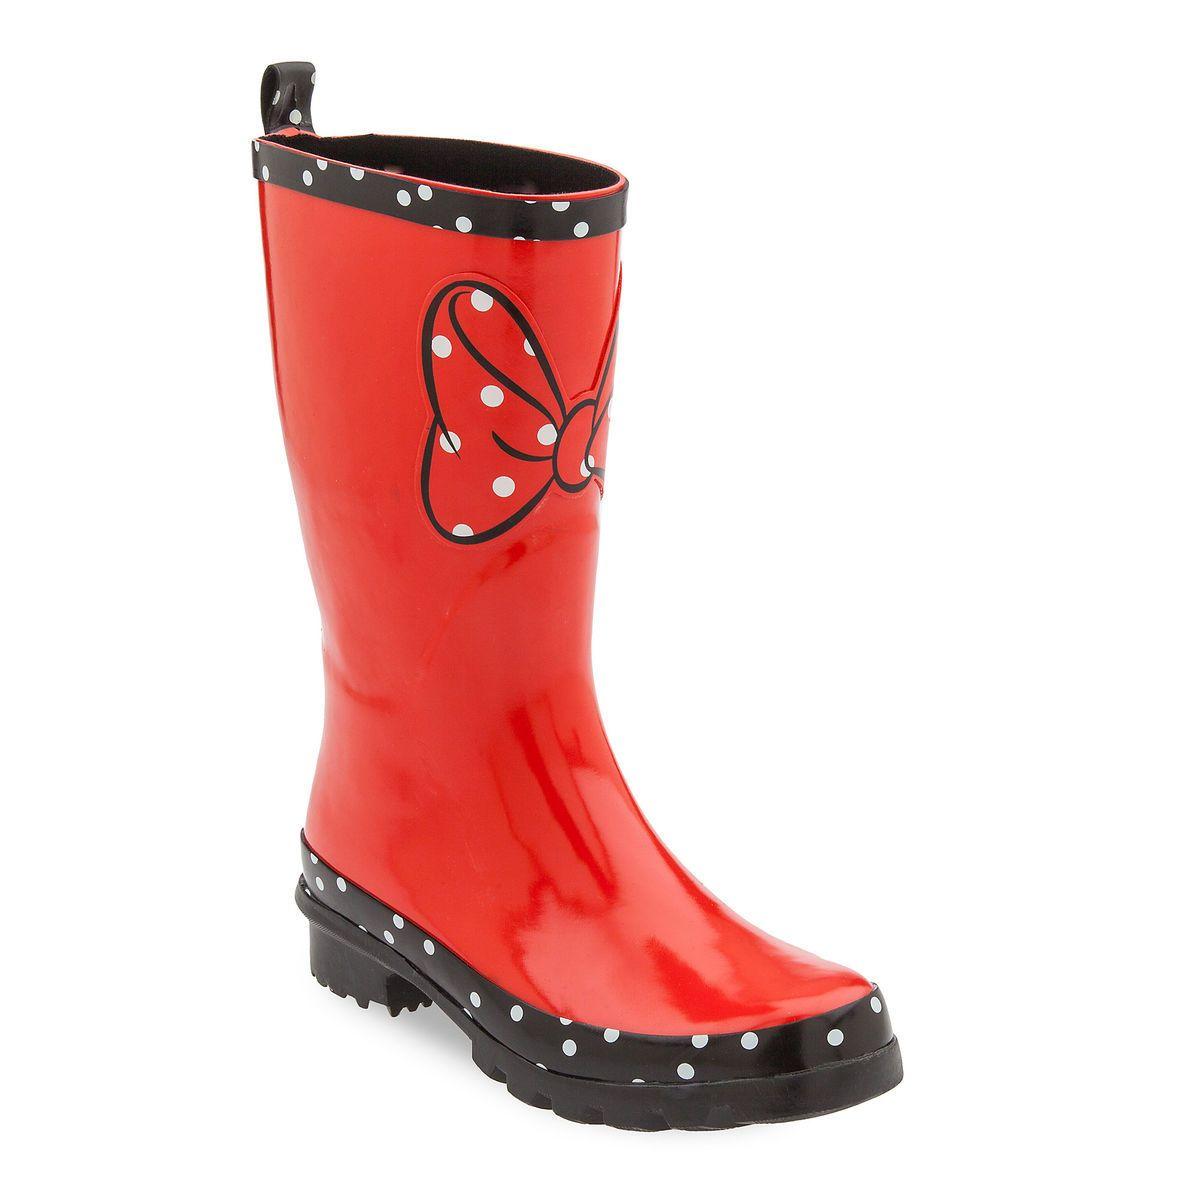 Minnie Mouse Rainboots for Women | Rain